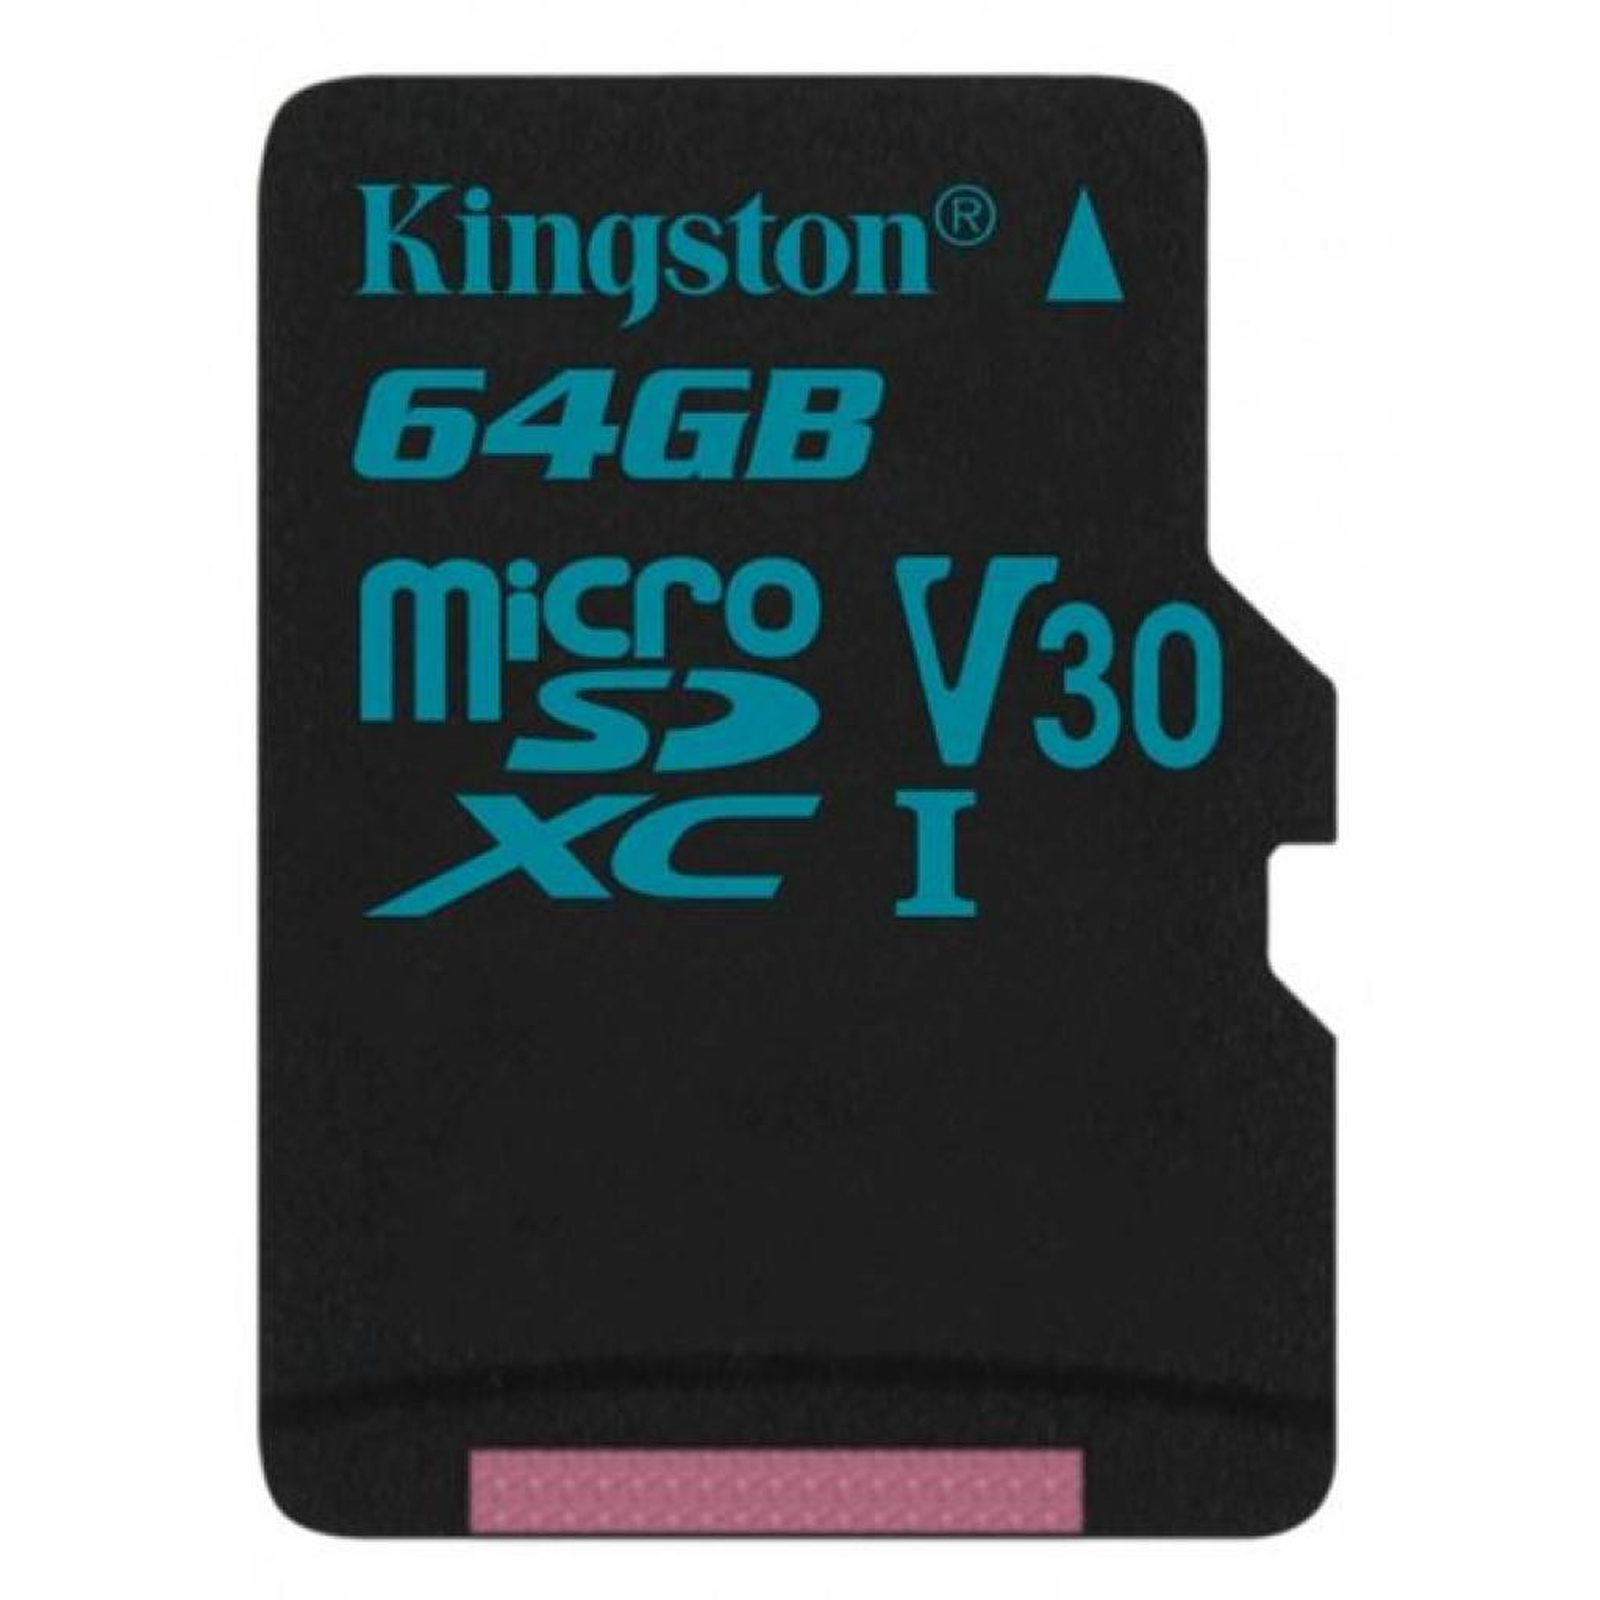 Карта памяти Kingston 64GB microSDXC class 10 UHS-I U3 Canvas Go (SDCG2/64GBSP)